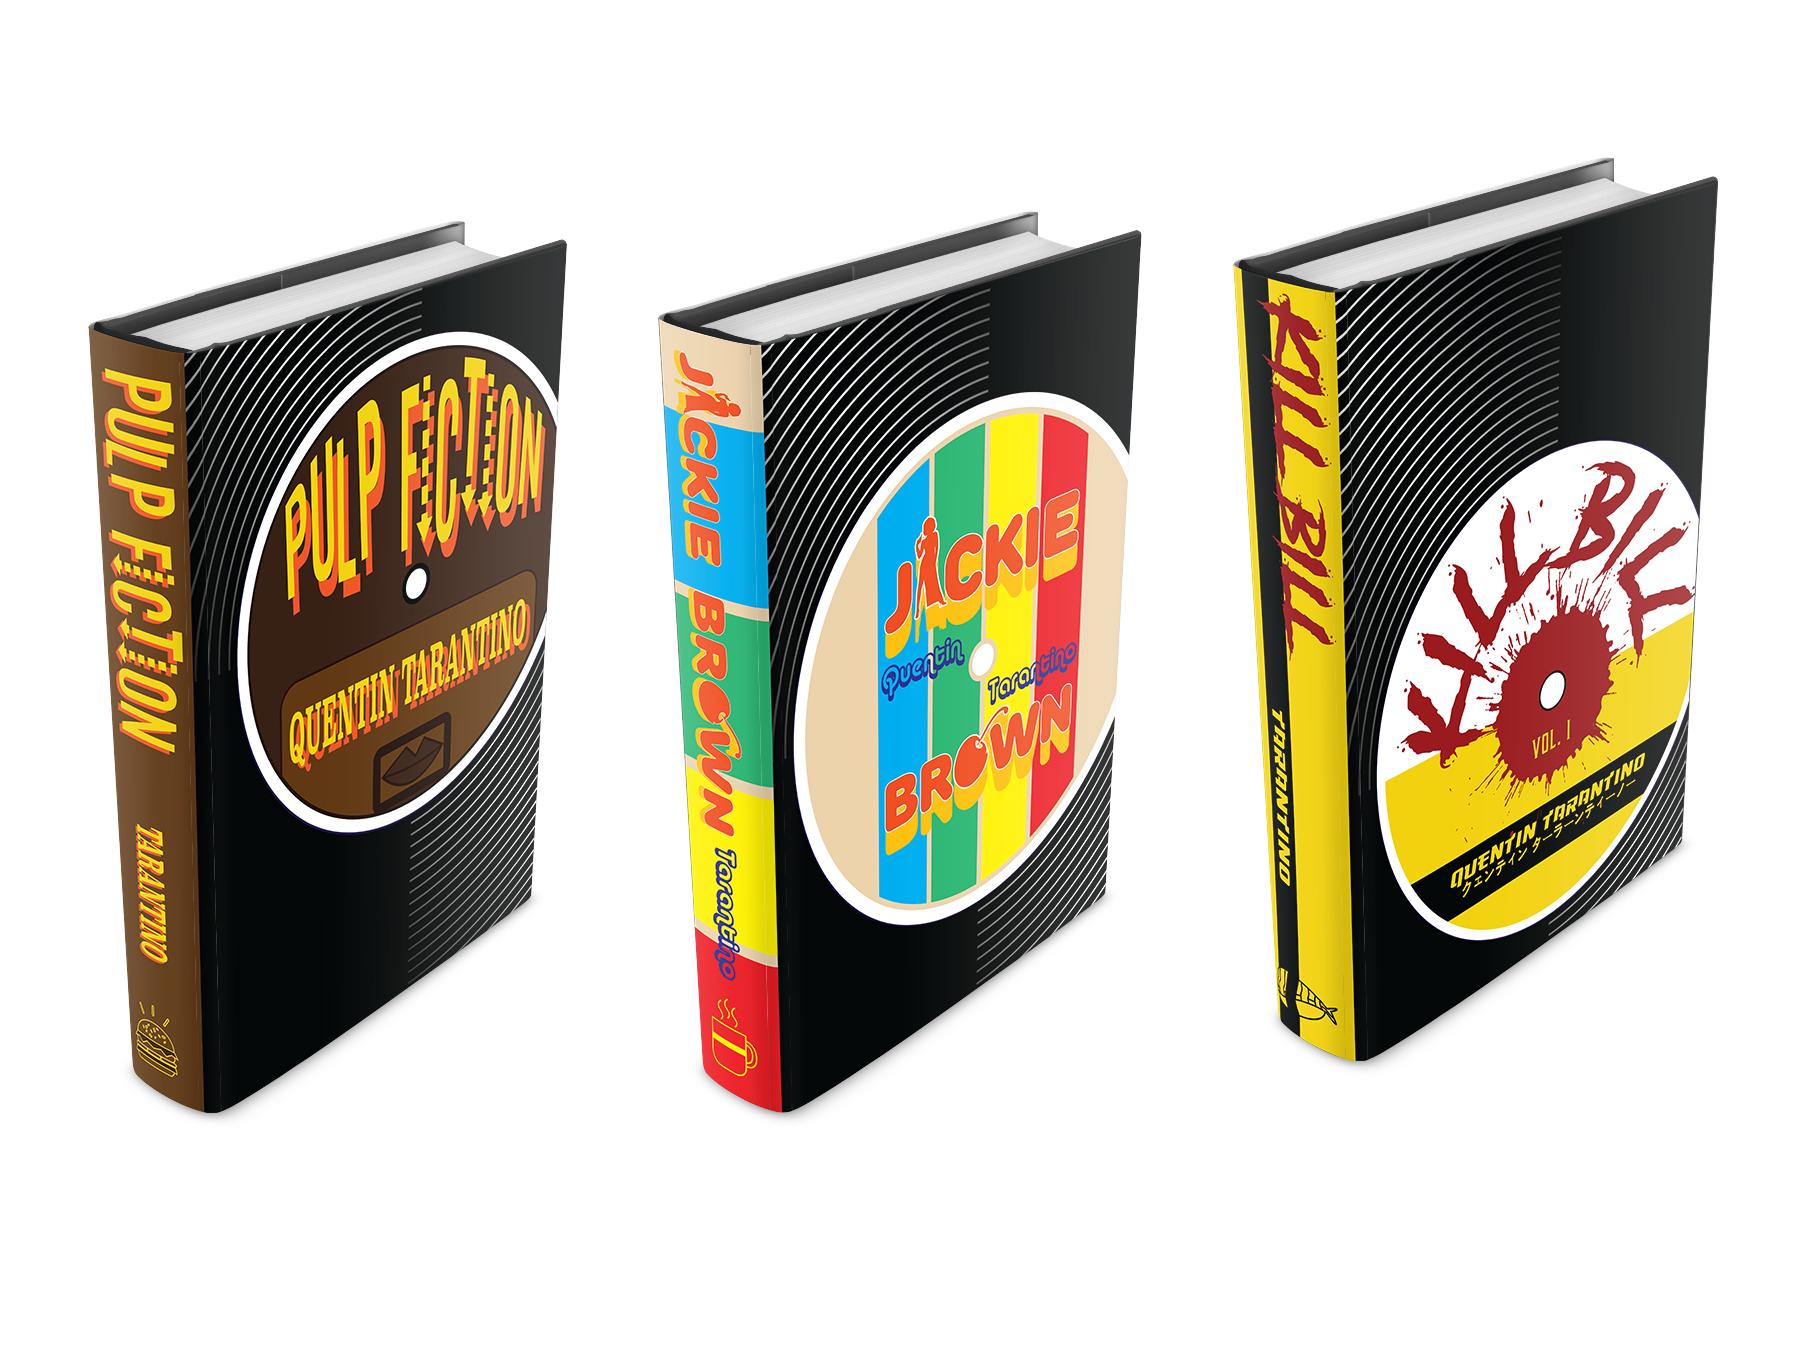 Ben Buttles, Tarantino Bookjacket Series